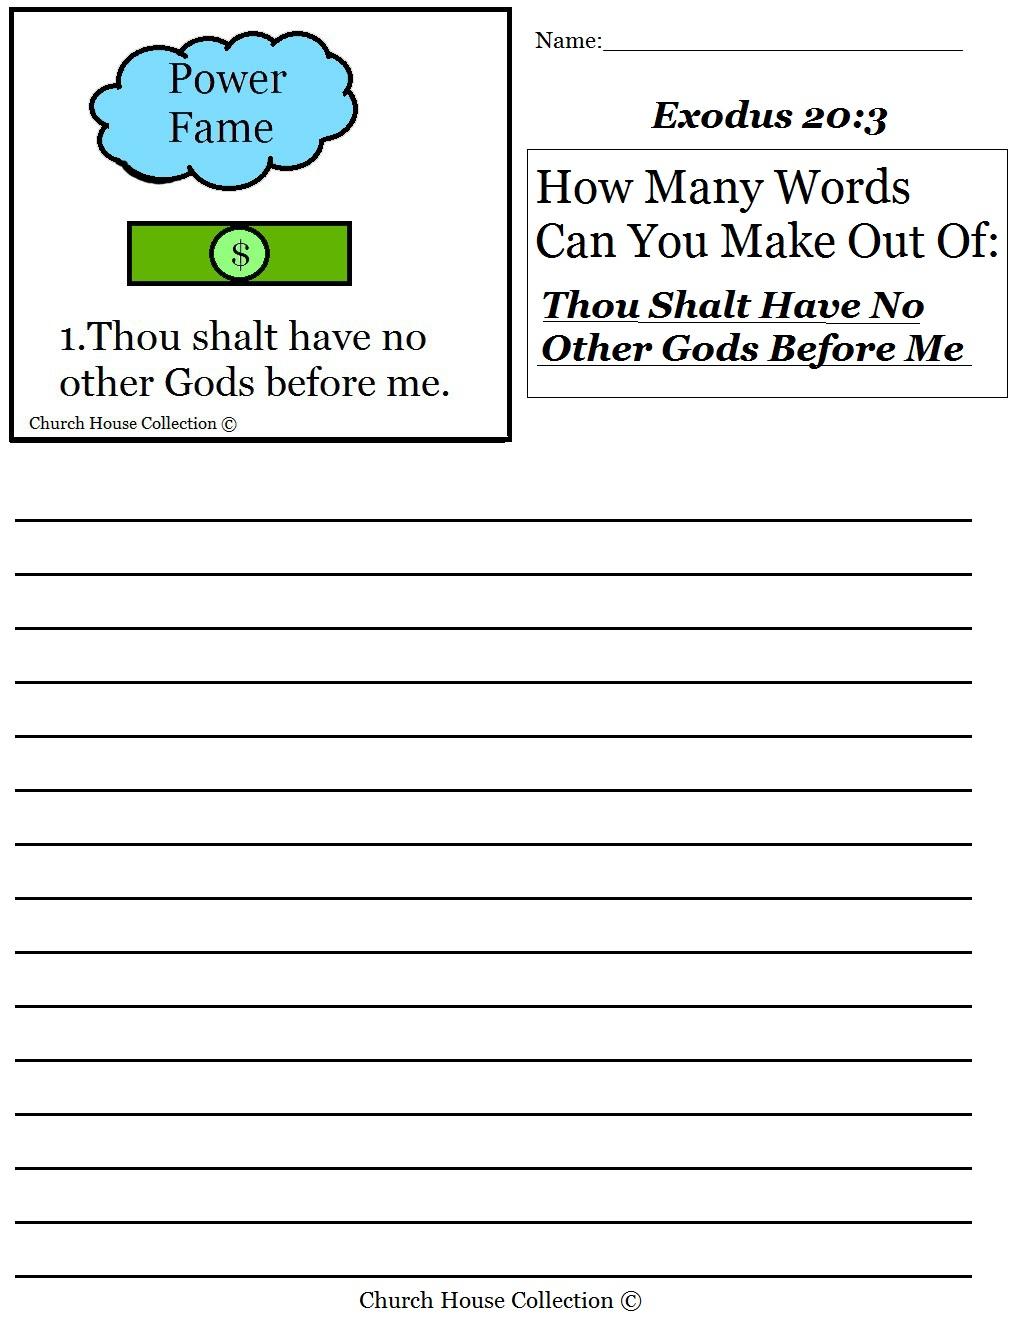 Church House Collection Blog: Thou Shalt Have No Other Gods Before  math worksheets, worksheets, free worksheets, education, and grade worksheets Ten Commandments Worksheets For Kids 1319 x 1019